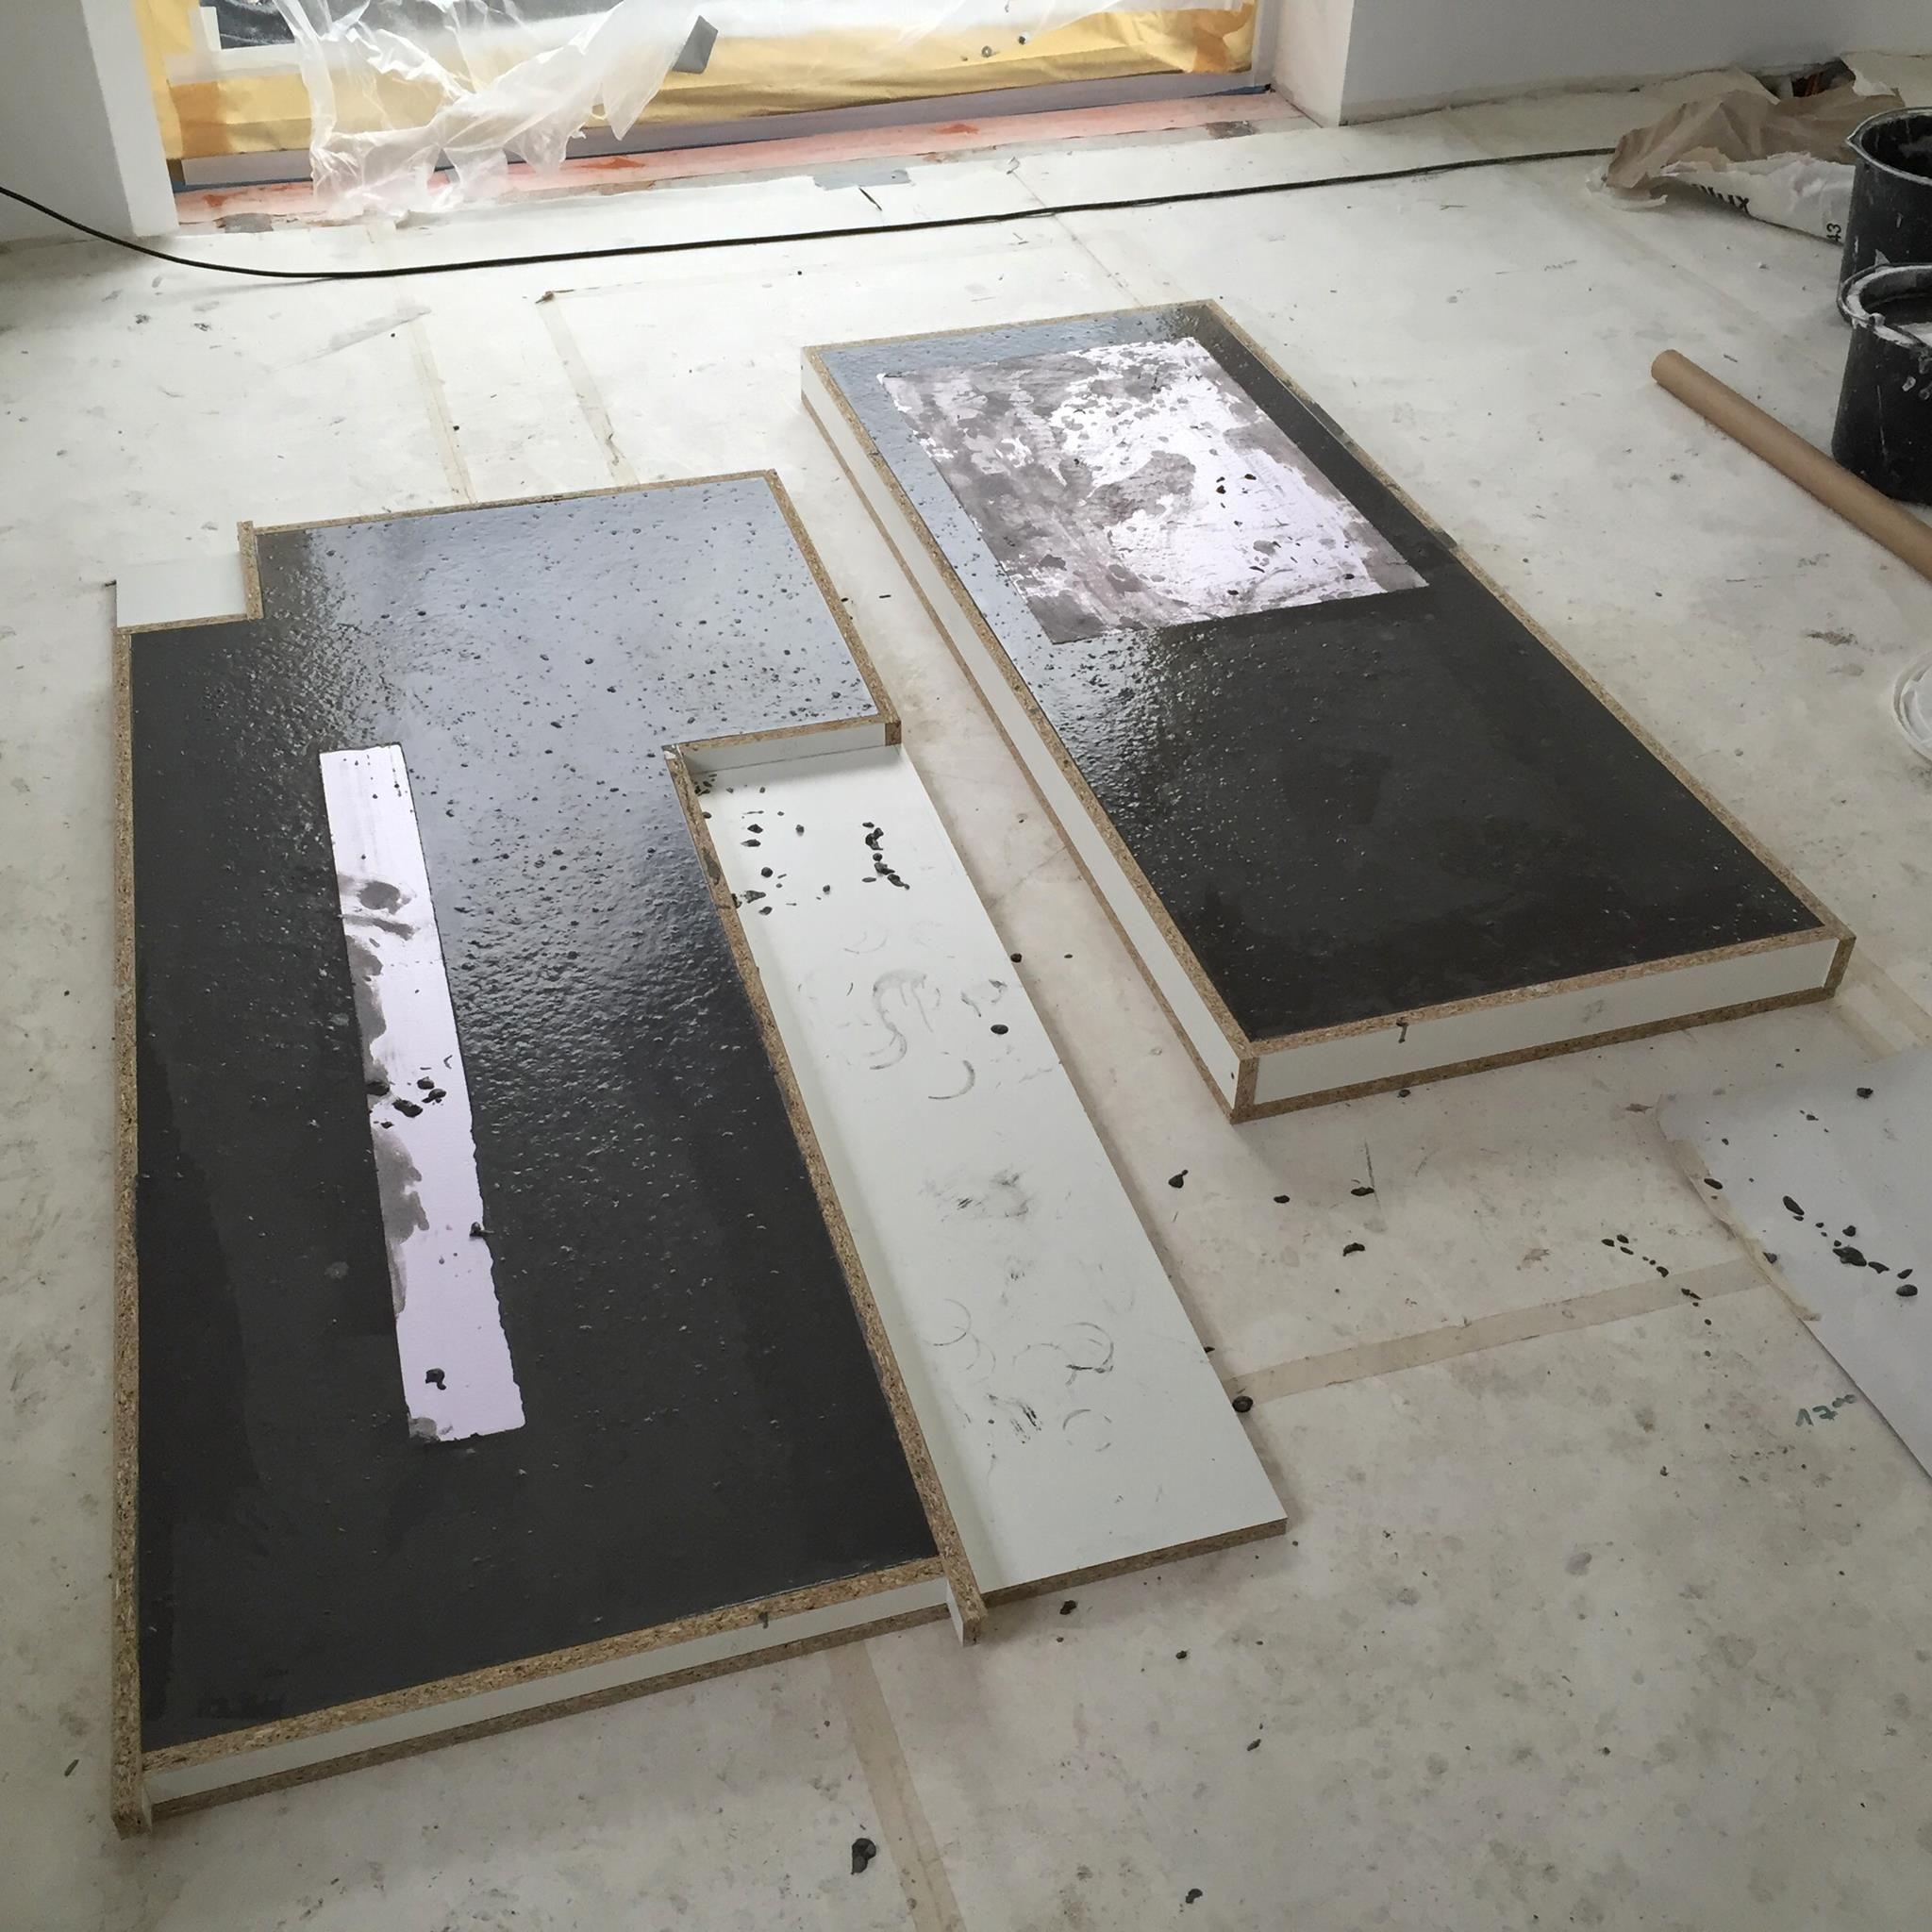 Arbeitsplatten Aus Beton Diy Bigmeatlove Arbeitsplatte Betonarbeitsplatte Arbeitsplatte Kuche